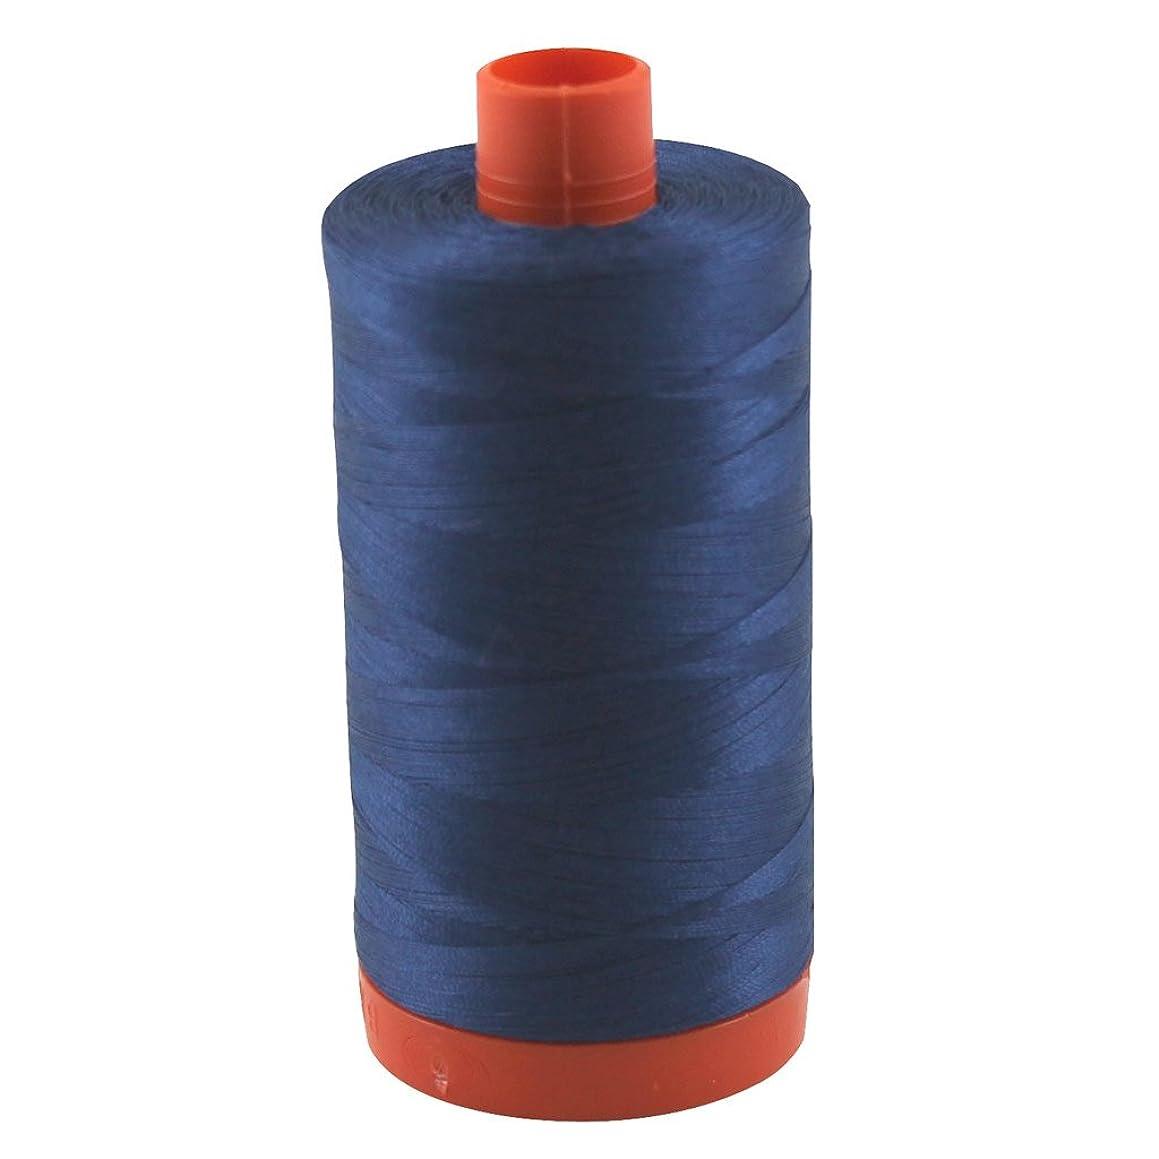 Aurifil Thread 2783 MEDIUM DELFT BLUE Cotton Mako 50wt Large Spool 1300m